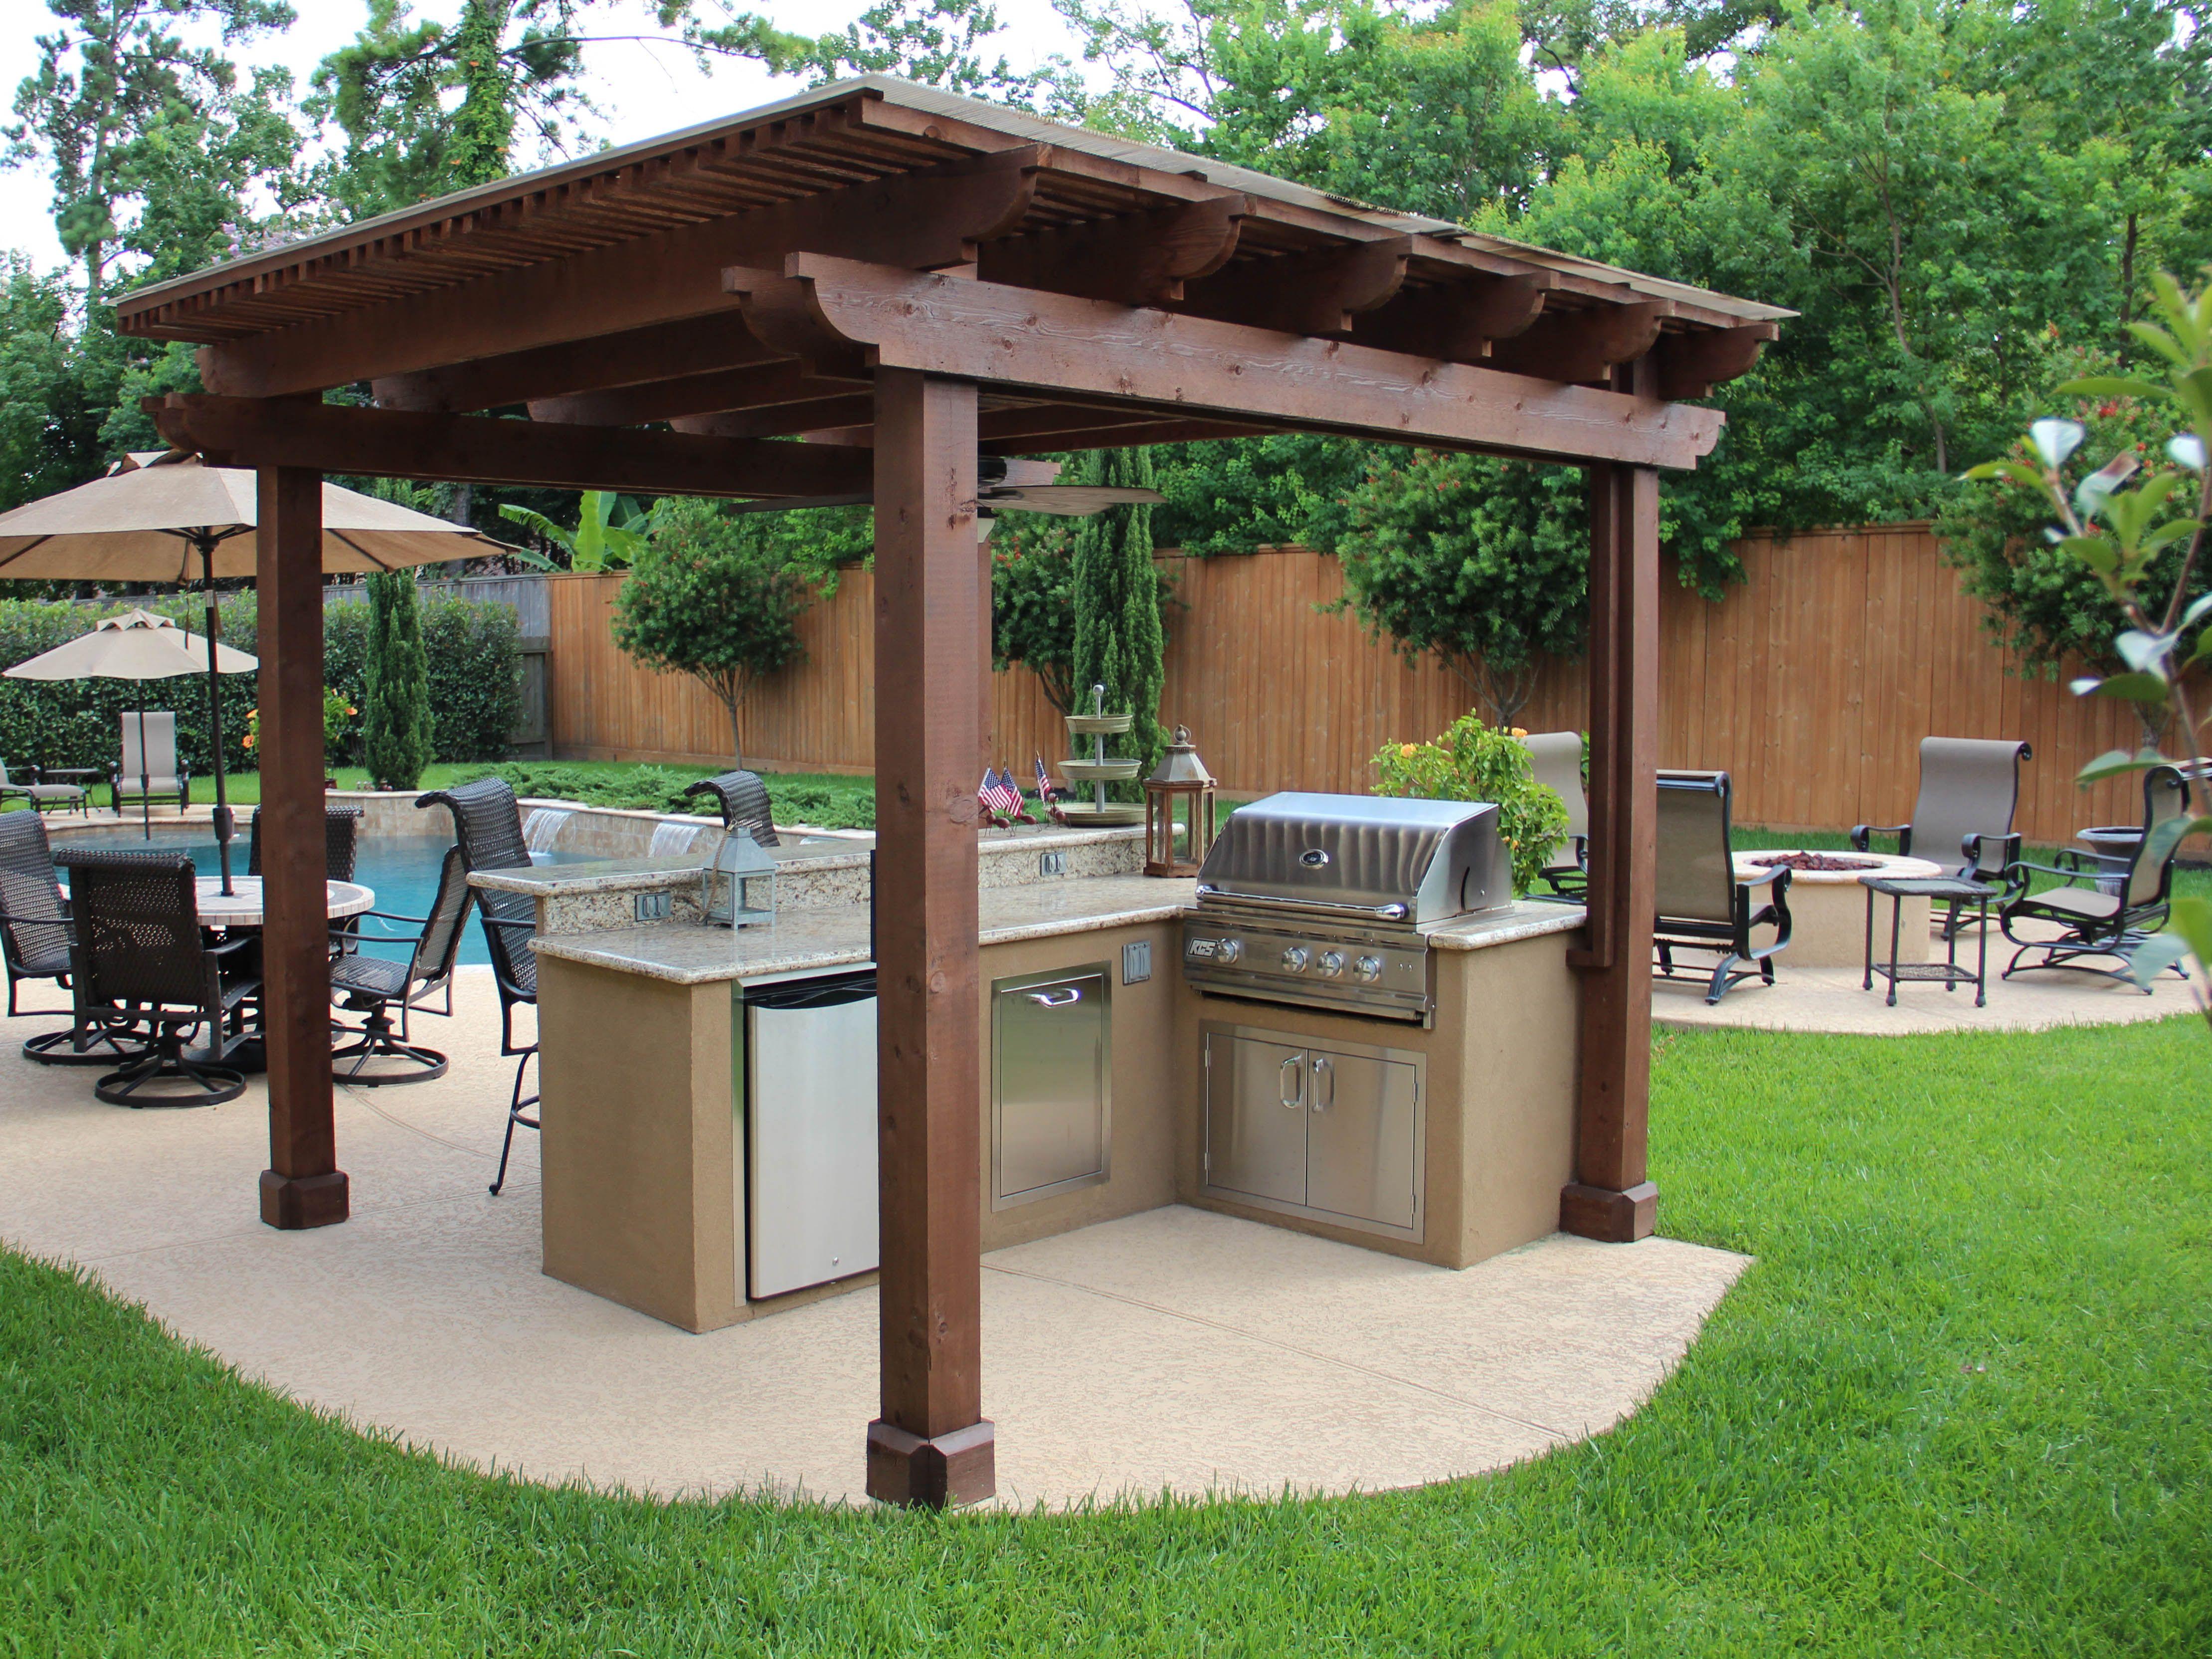 Www Customoutdoors Com Shade Arbor Over Outdoor Kitchen Covered Patio Outdoor Kitchen Shade Arbor